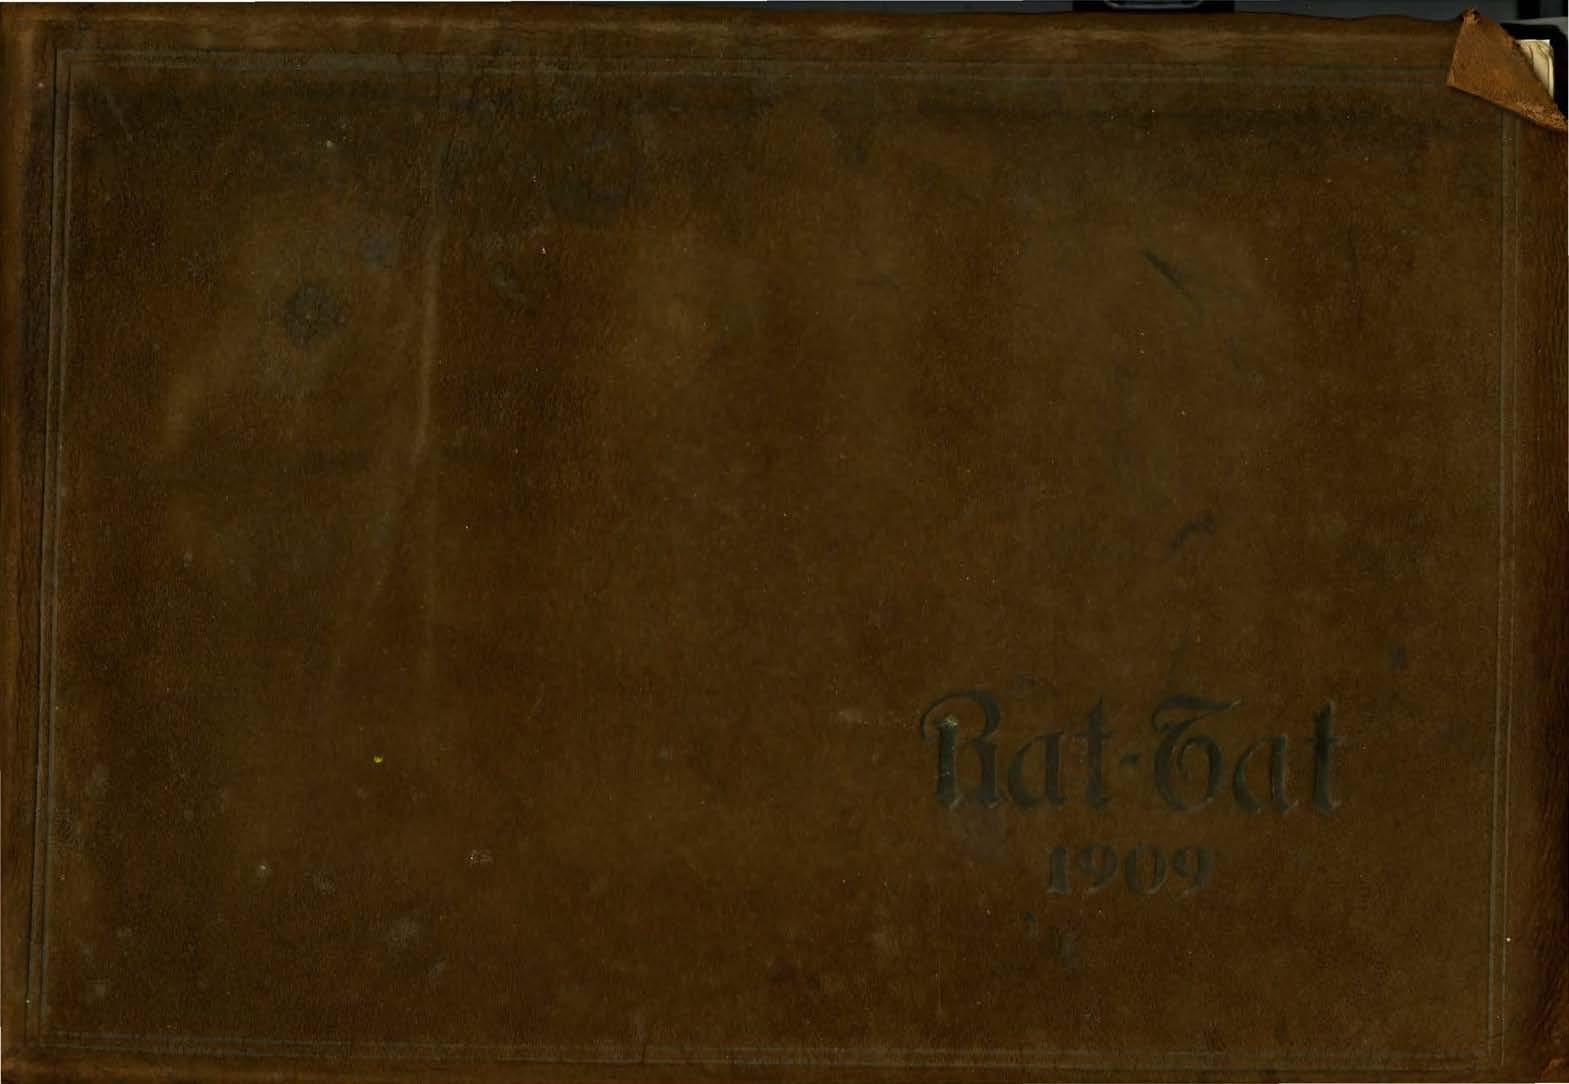 Rat-Tat 1909